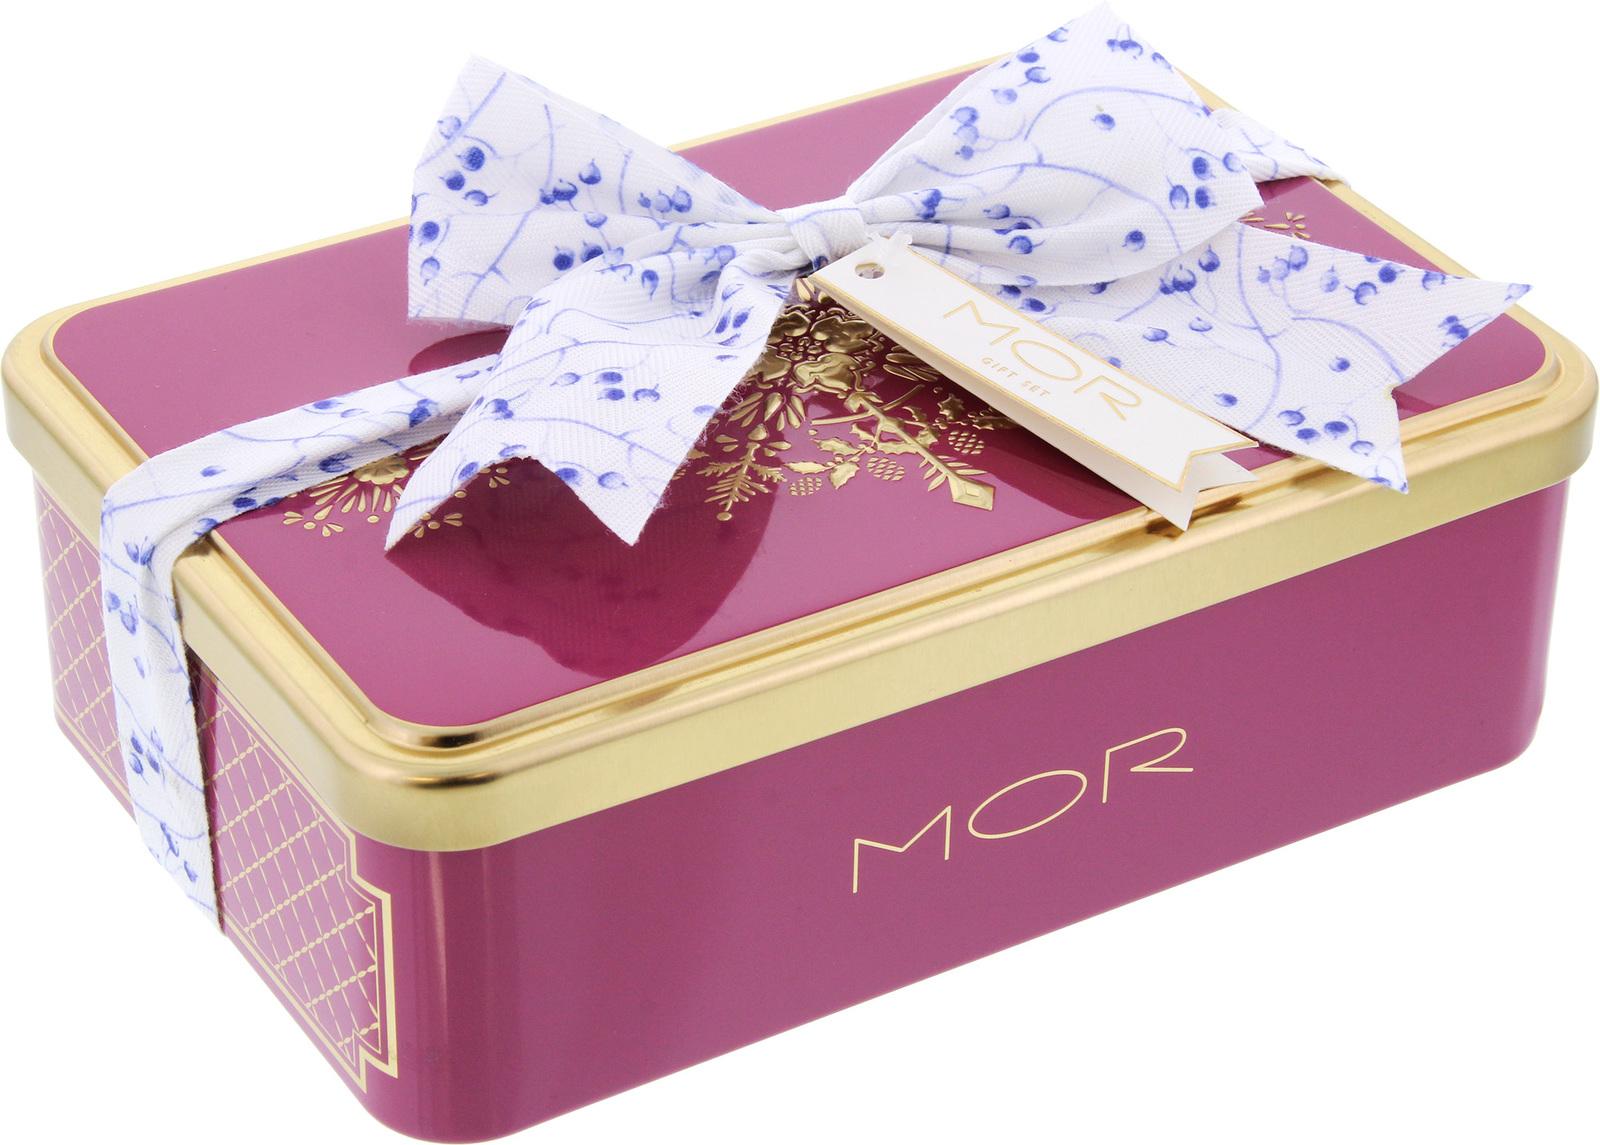 MOR Temptress Lychee Flower Gift Set image